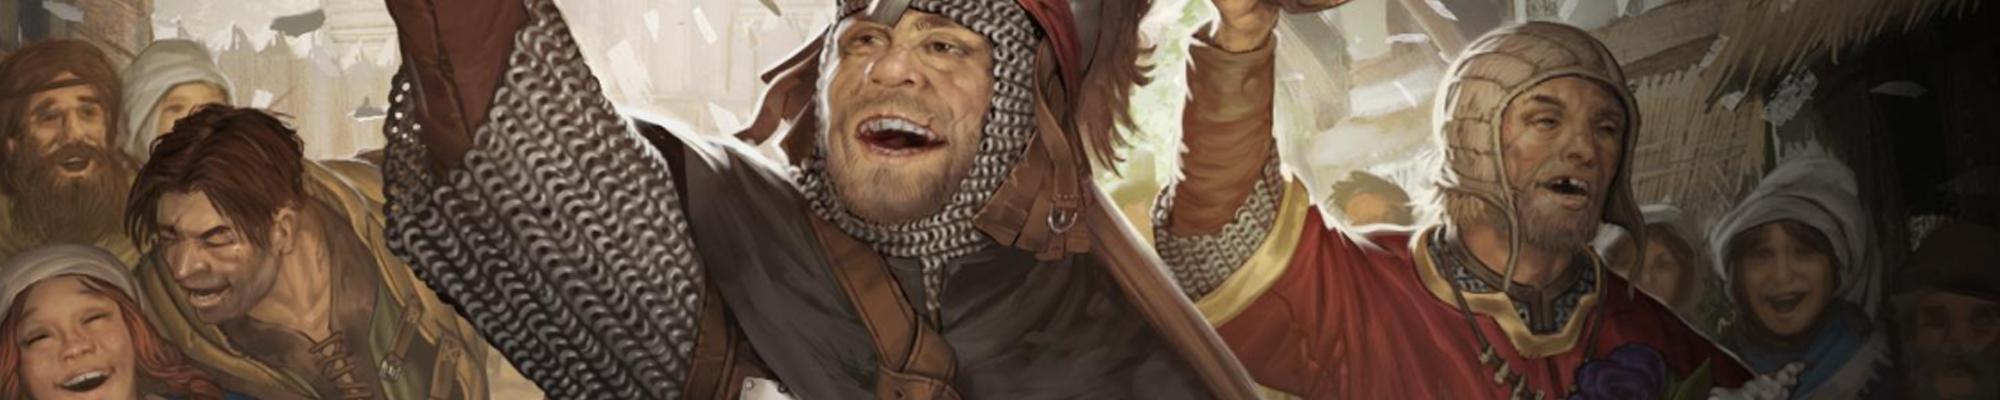 《Battle Brothers》的傷——皮格馬利翁的痛